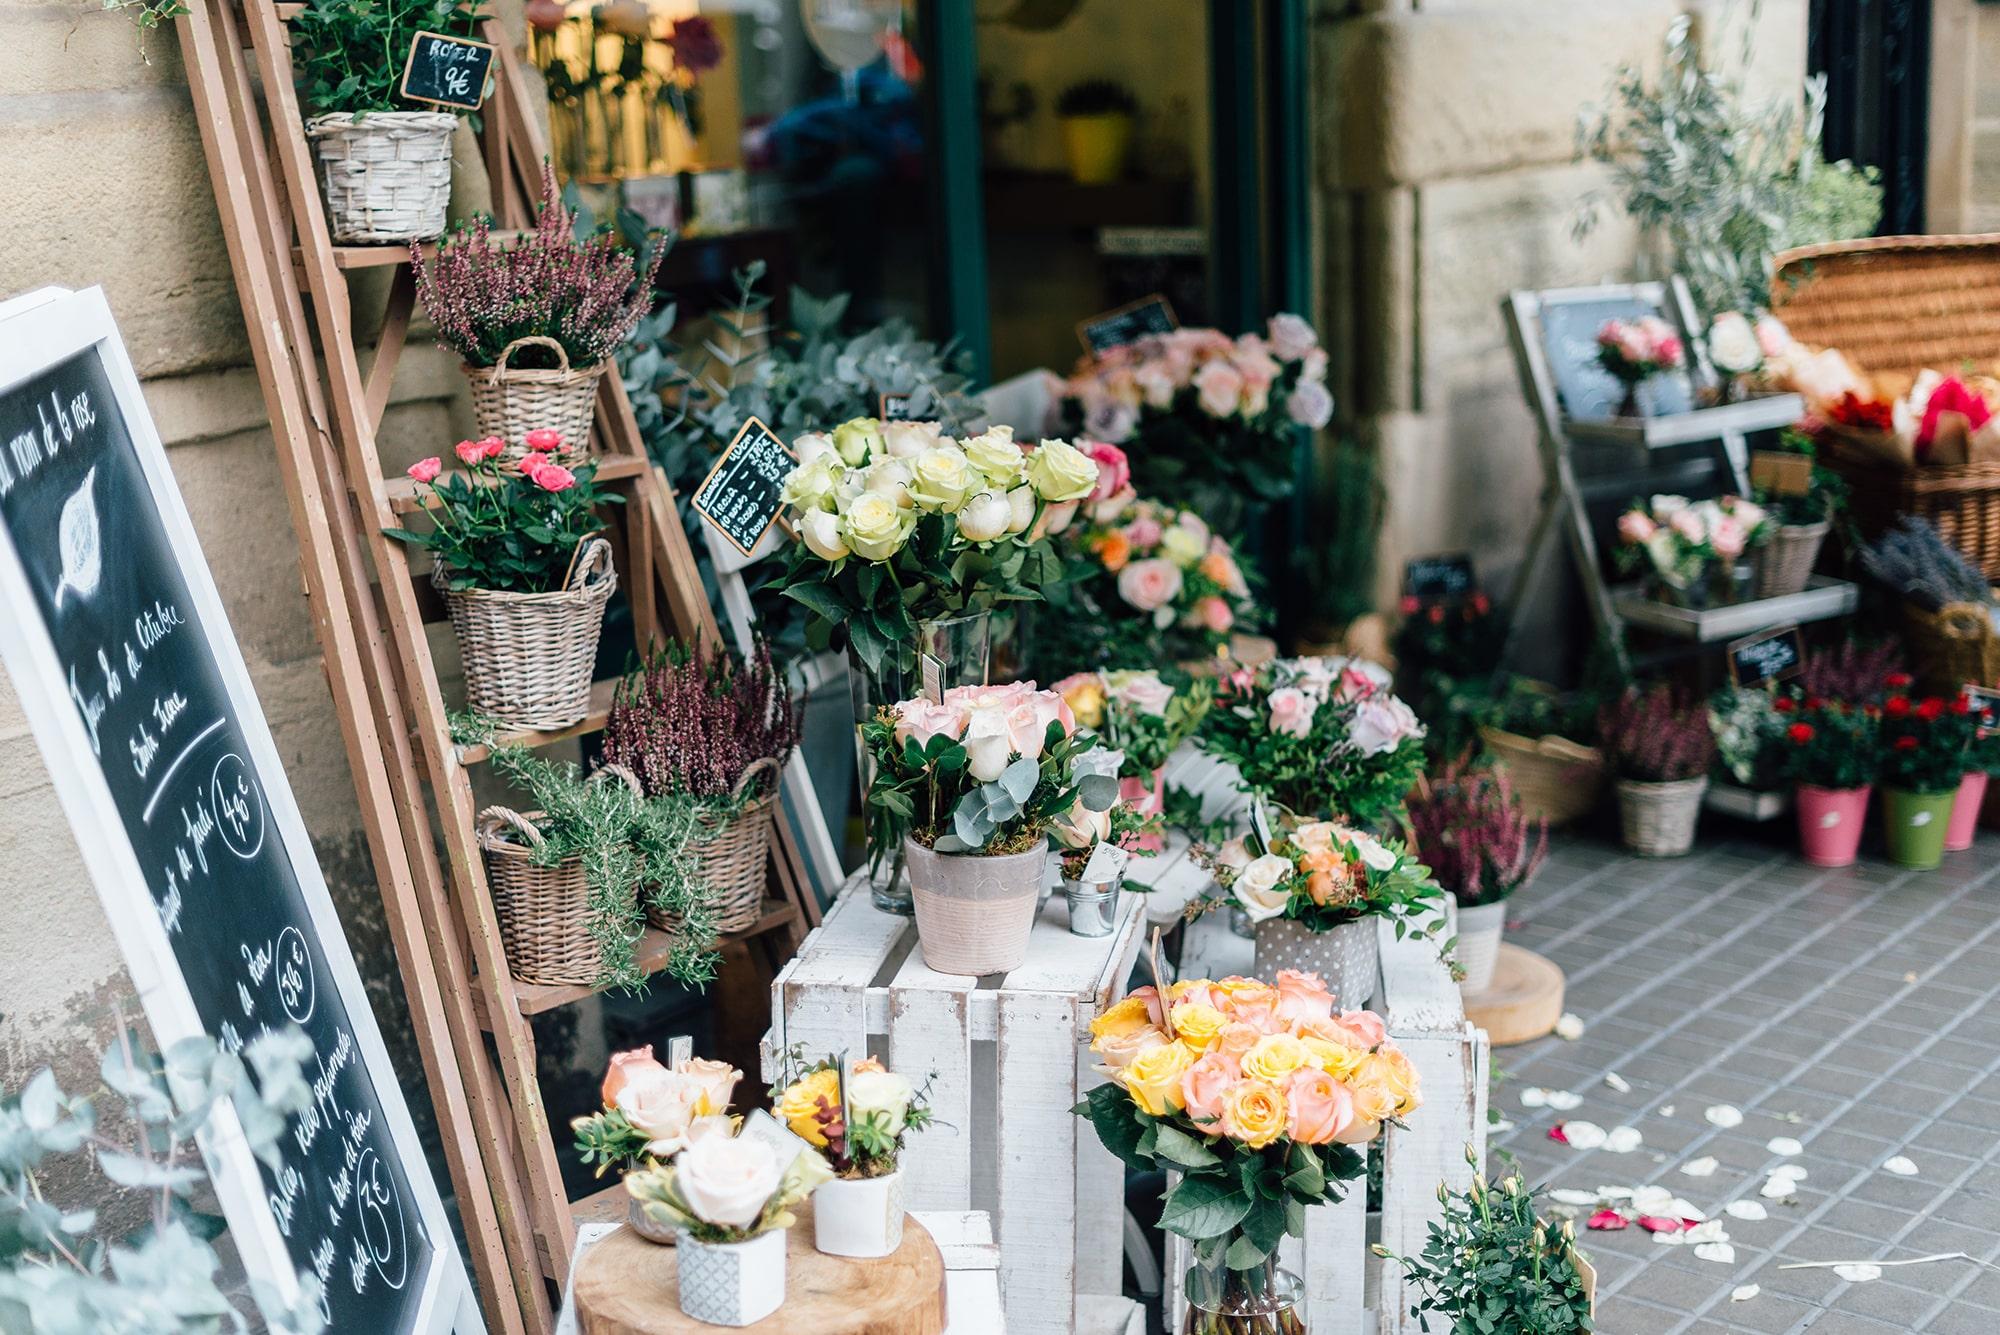 Columbia Flower Market, London